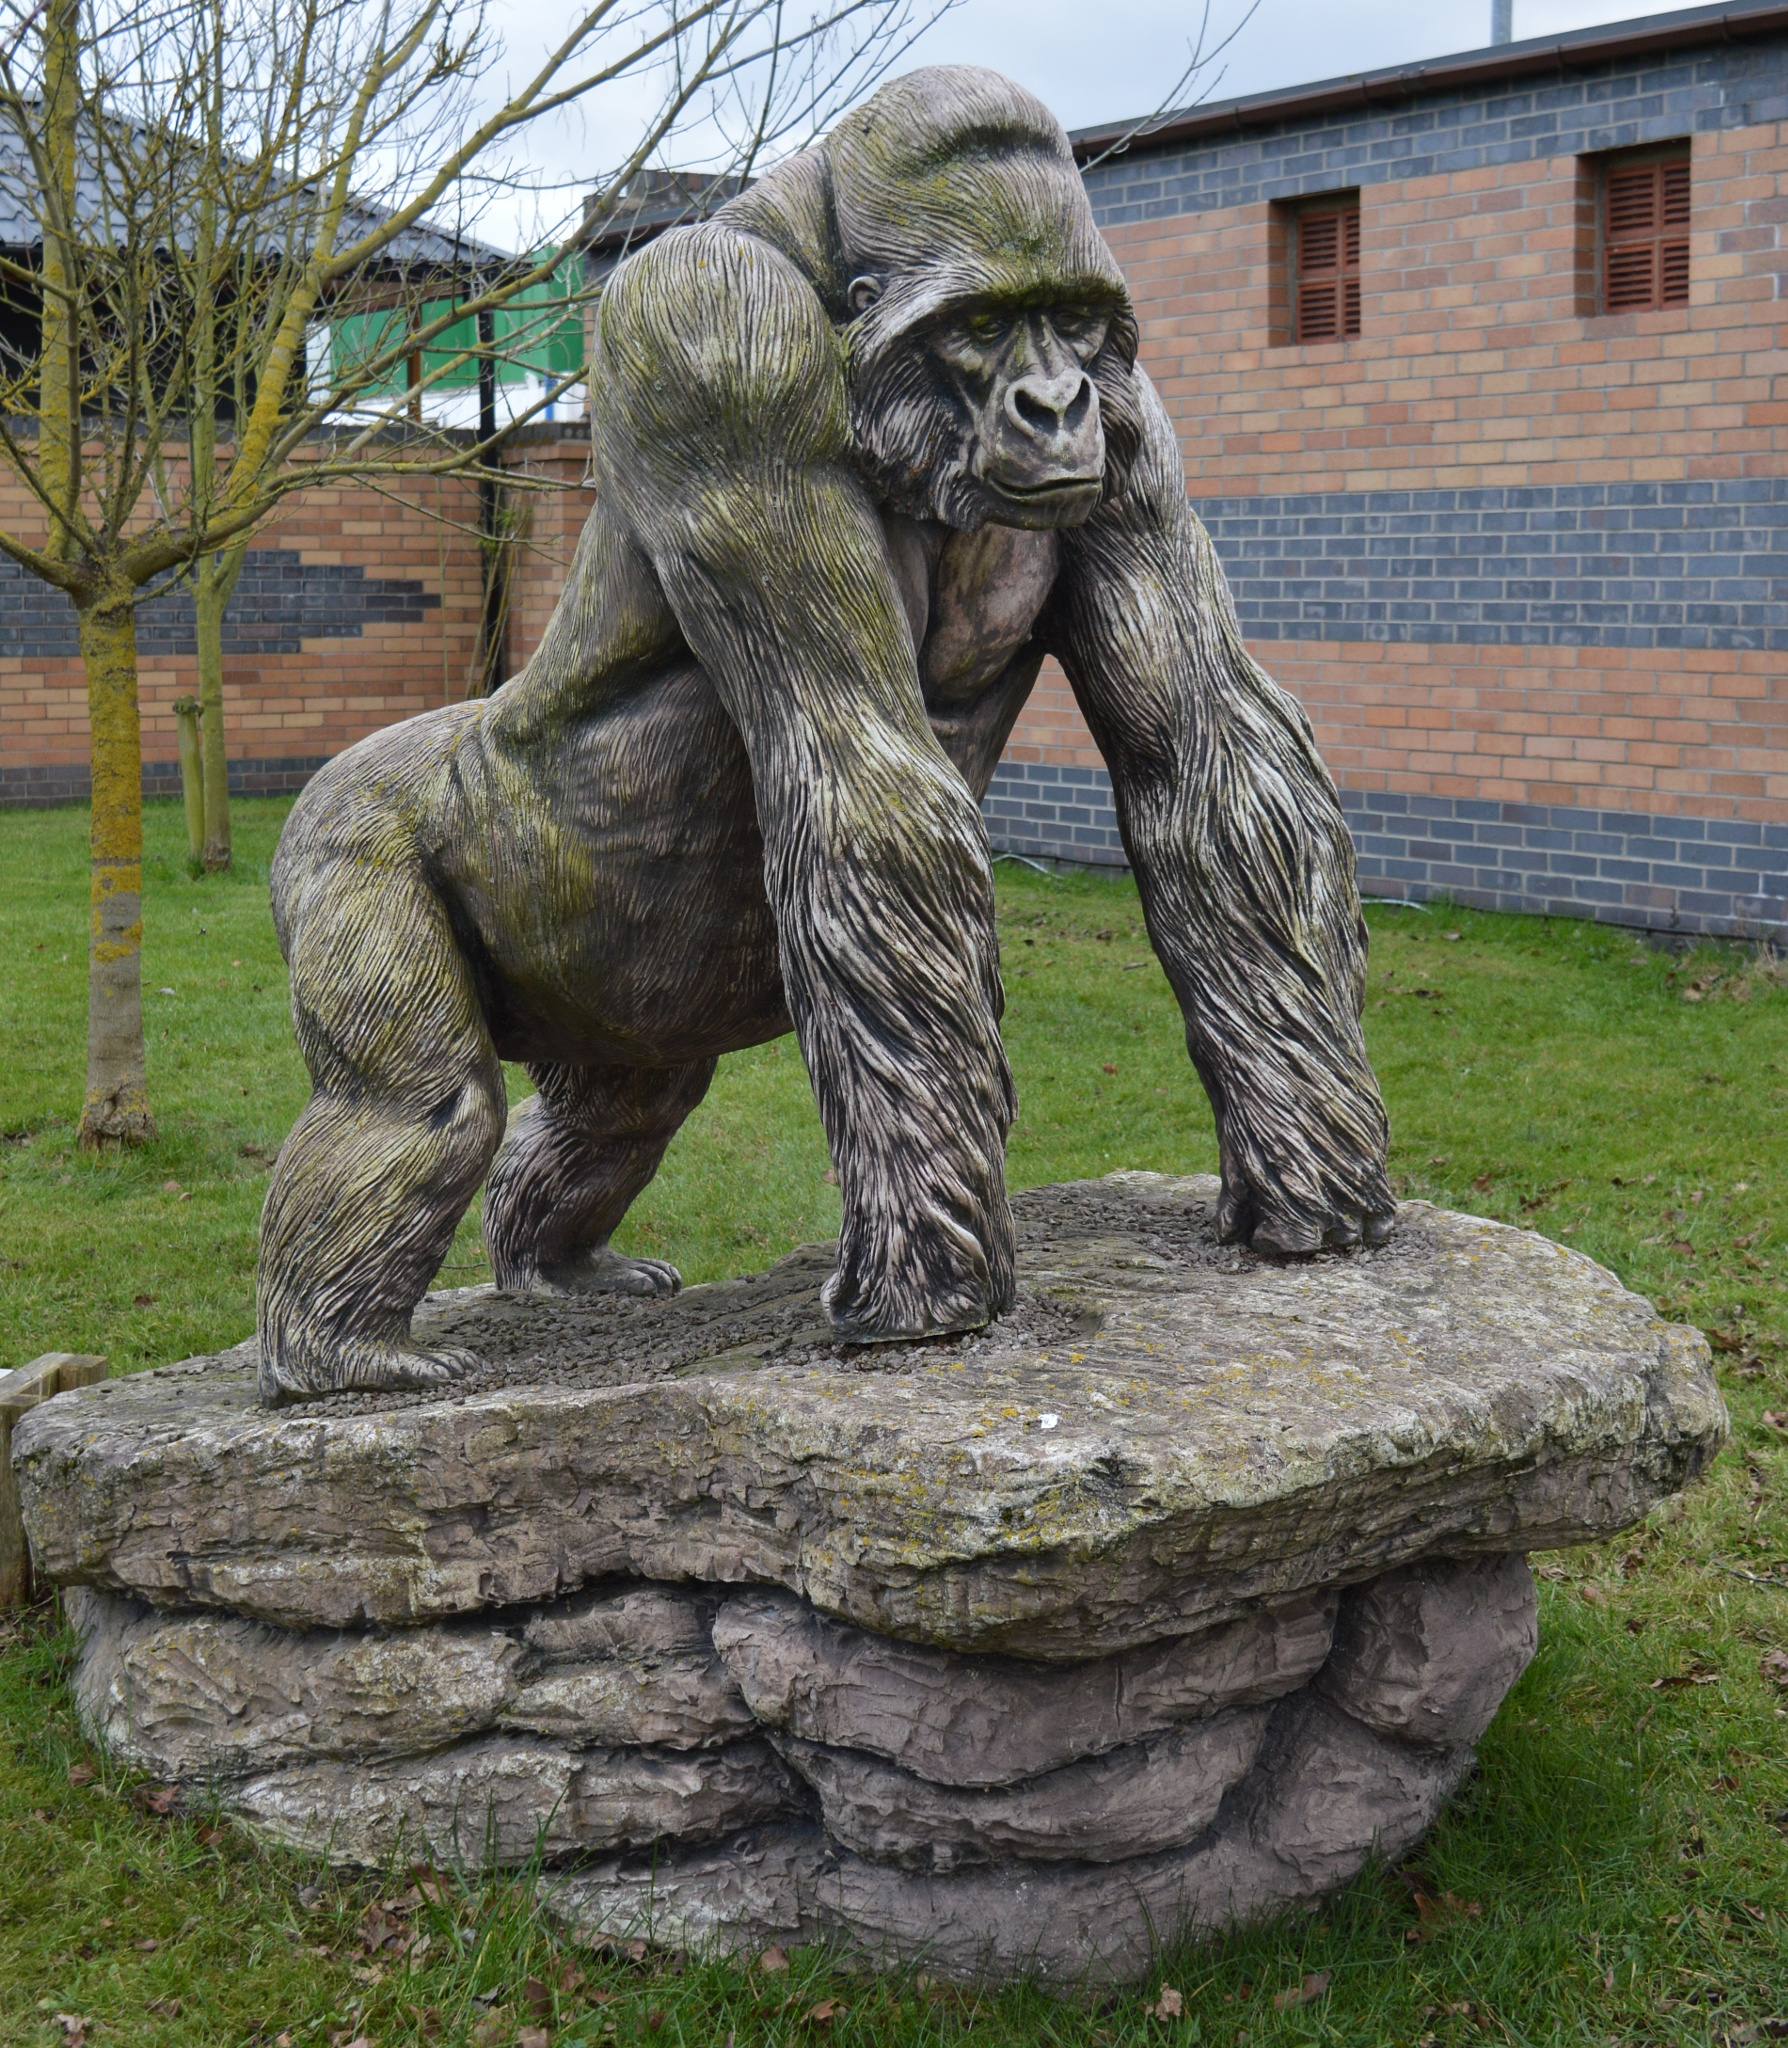 Gorilla 3 by declan delaney